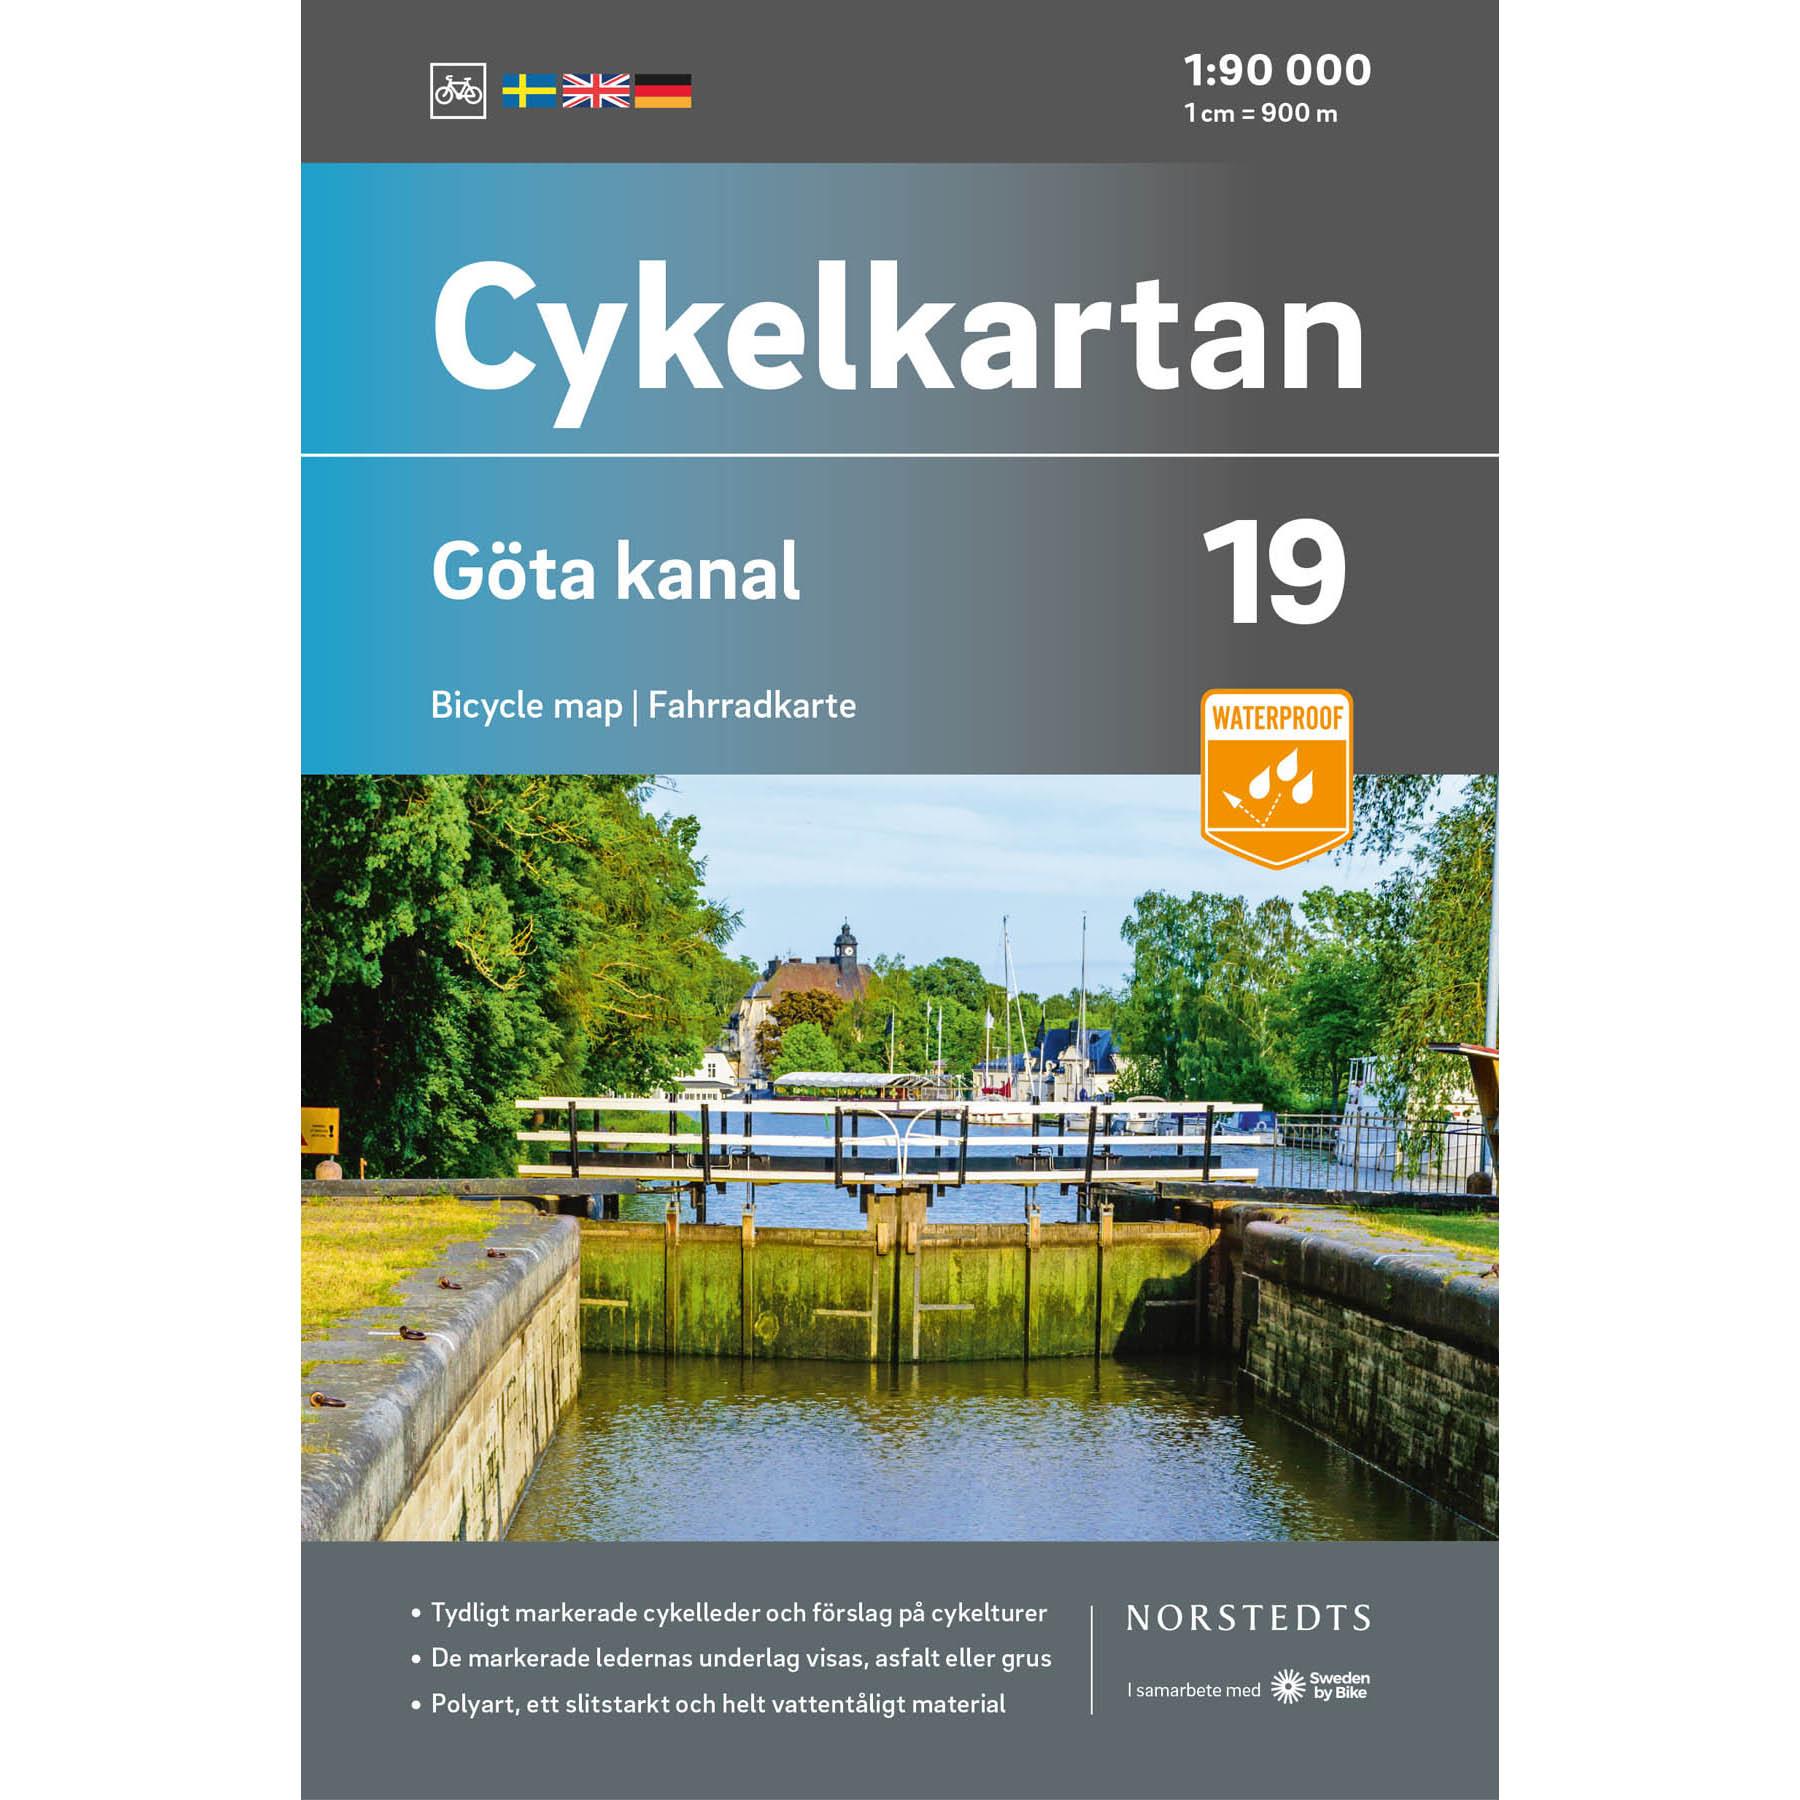 The Gota Canal | Hyr bt p Gta kanal - Gta Kanal Charter